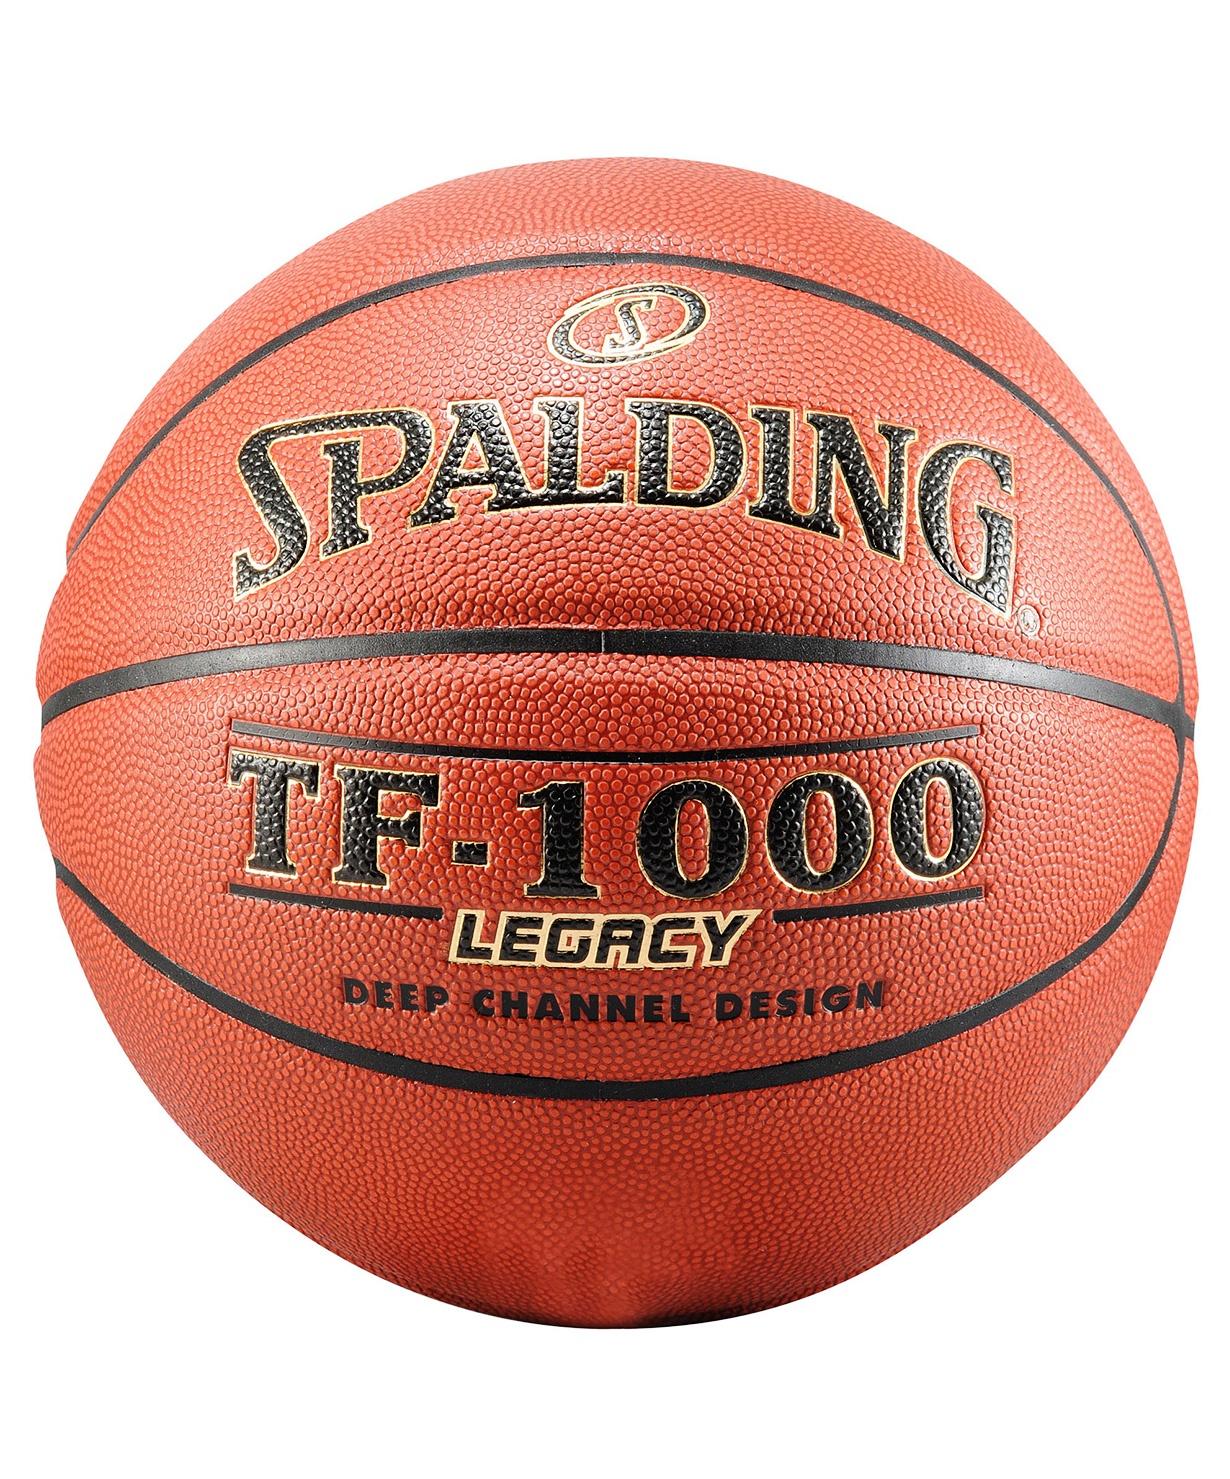 все цены на Мяч баскетбольный Spalding TF-1000 Legacy, Размер 7 онлайн